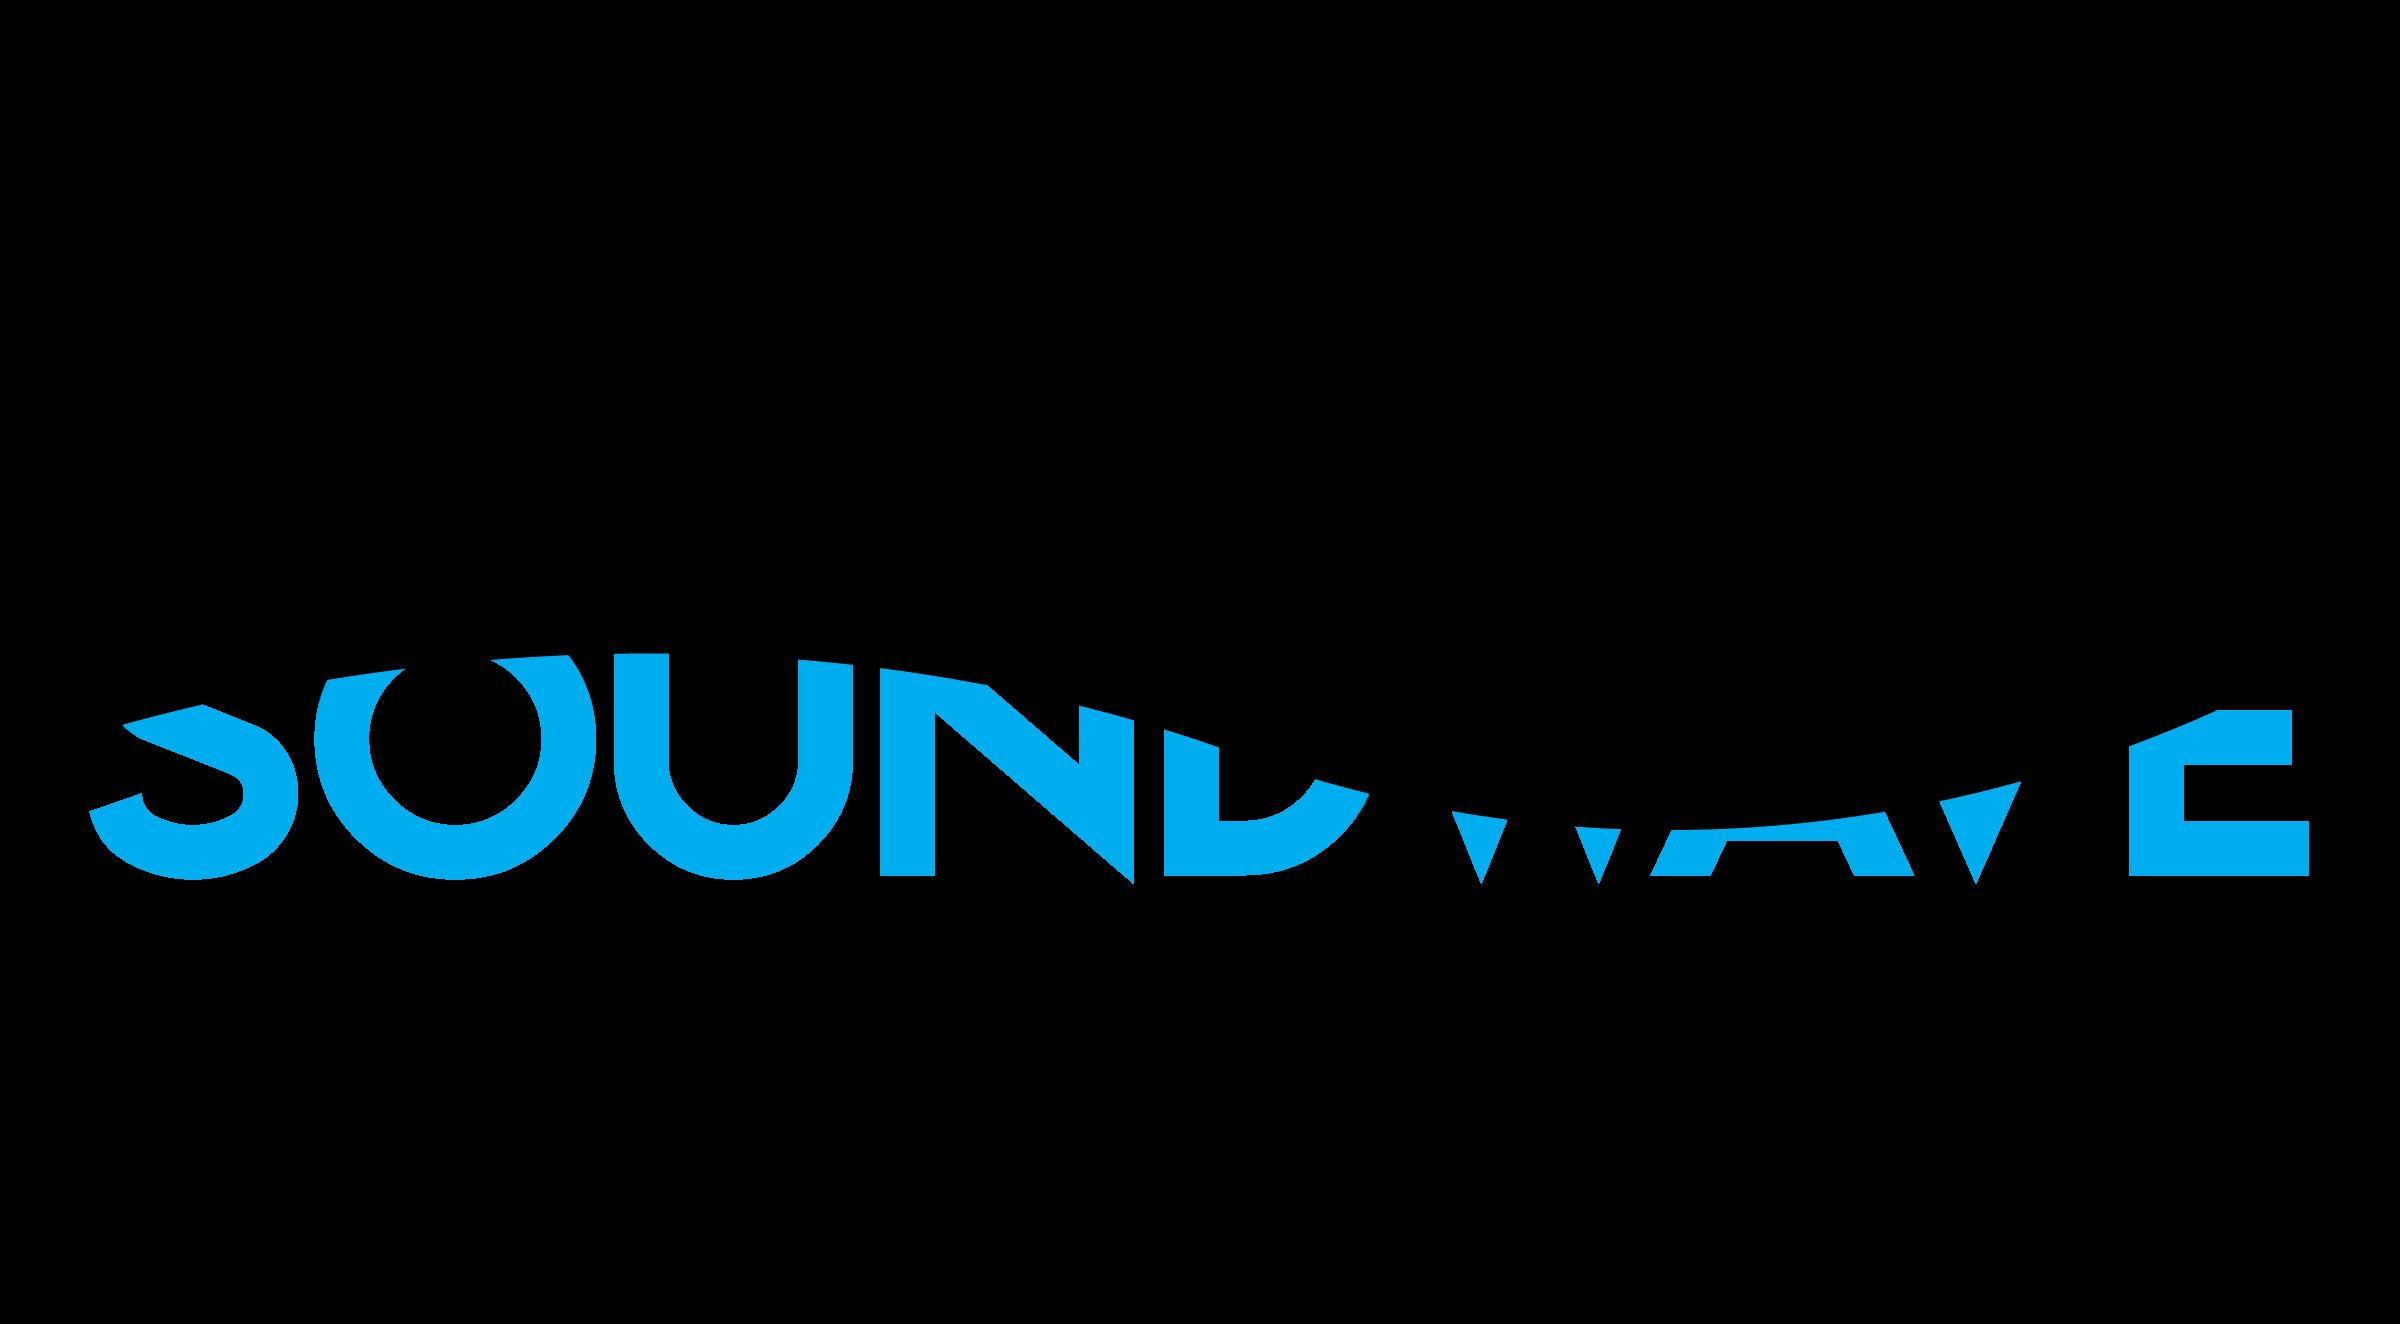 Soundwave-Tattoos-Logo.png